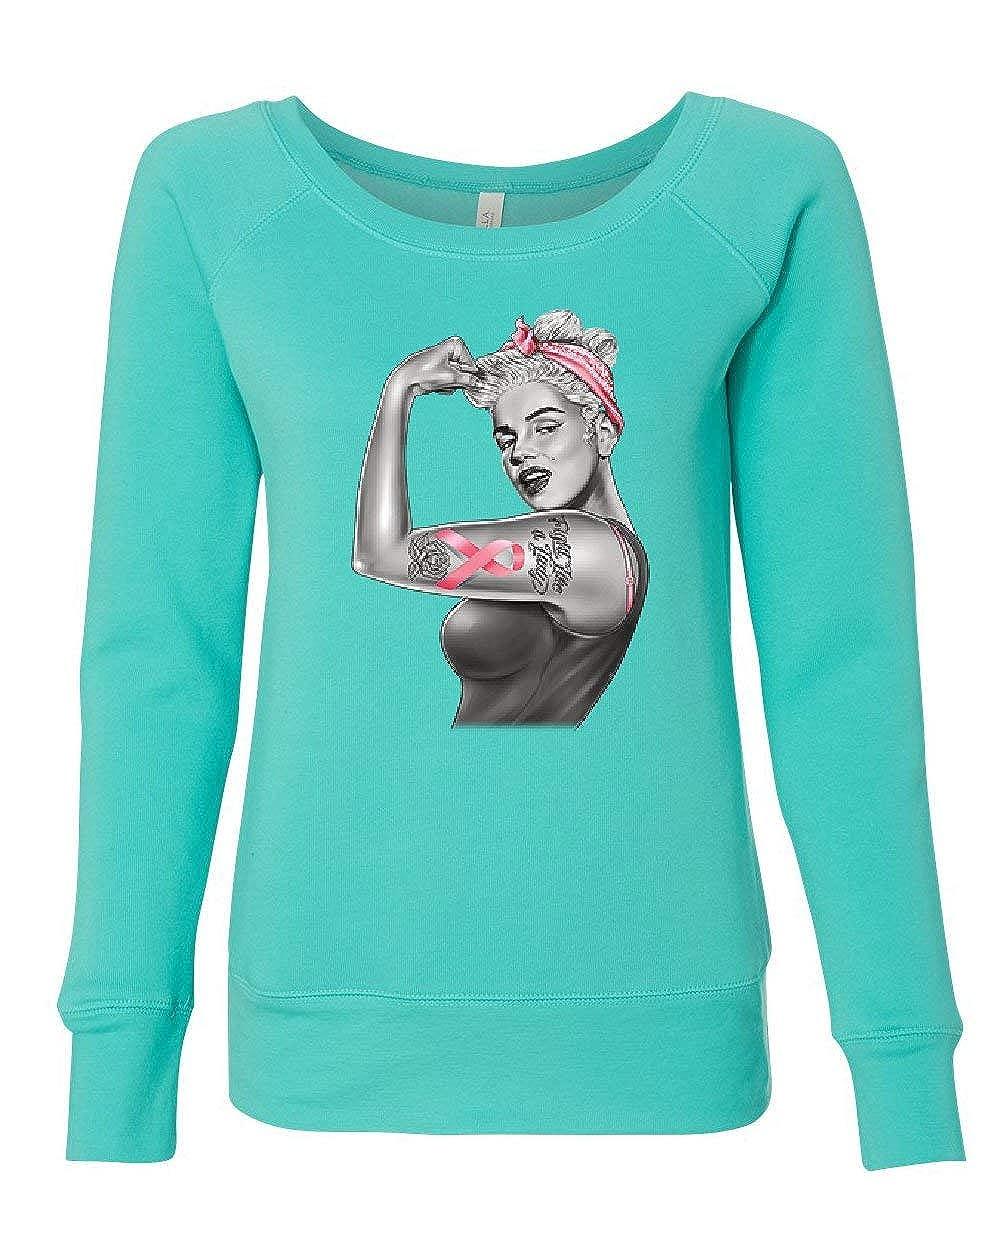 Pinup Marilyn Monroe Pink Ribbon Womens Sweatshirt Breast Cancer Awareness